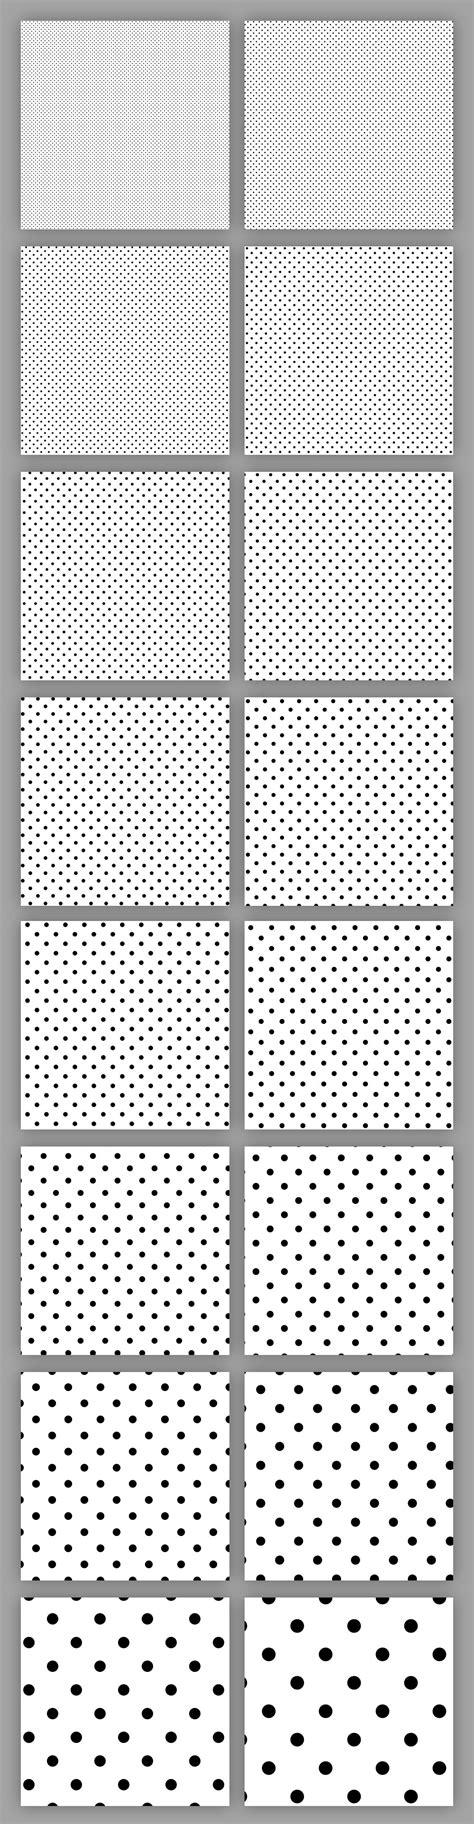 pattern download pat 16 free halftone seamless patterns graphicsfuel